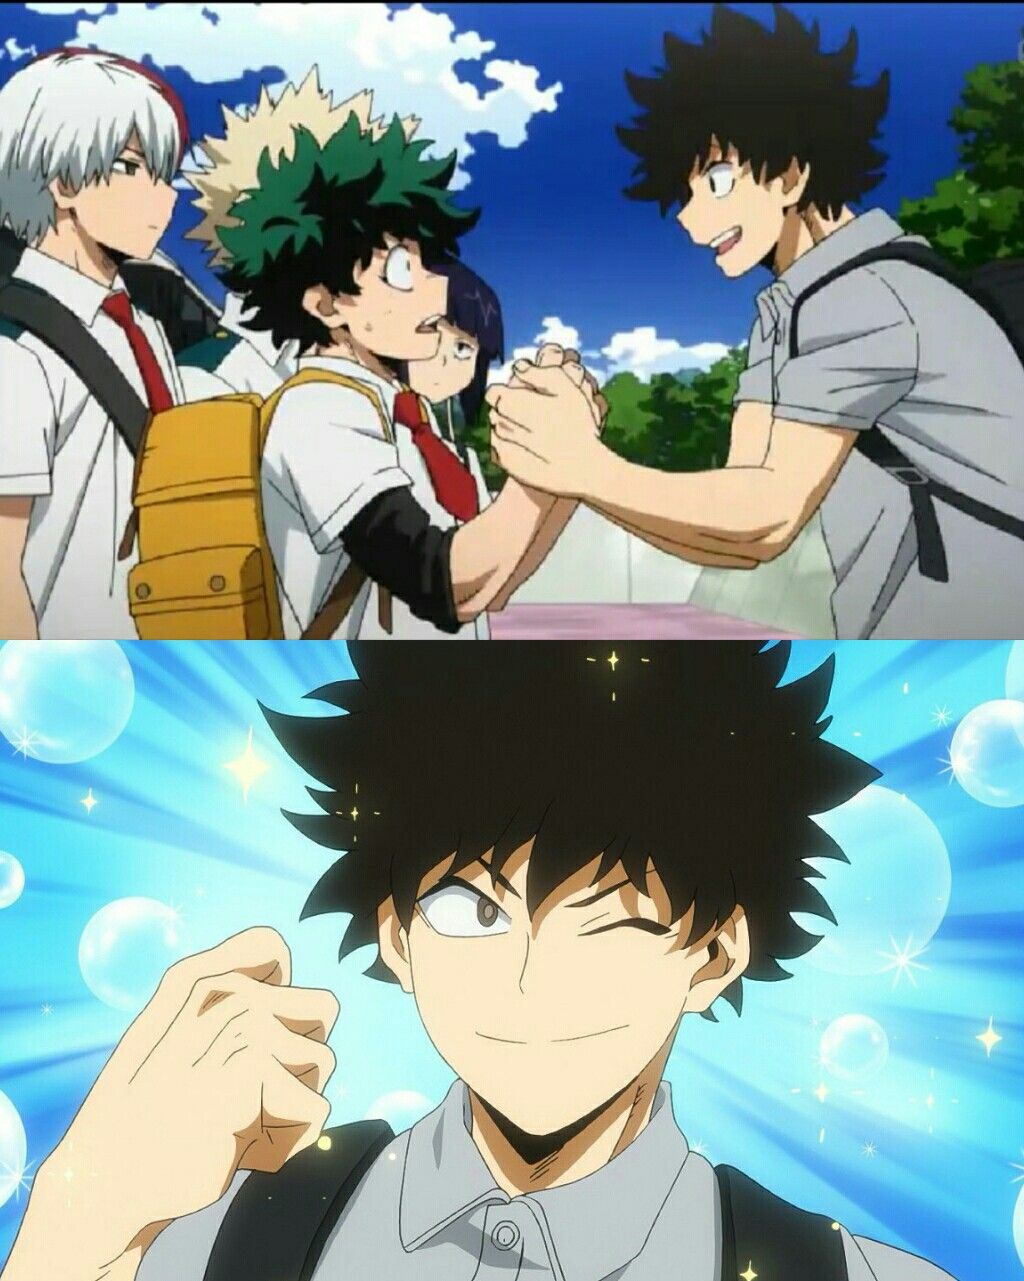 Boku No Hero Academia Season 3 Cap 15 Anime Boy Crying My Hero Academia Anime